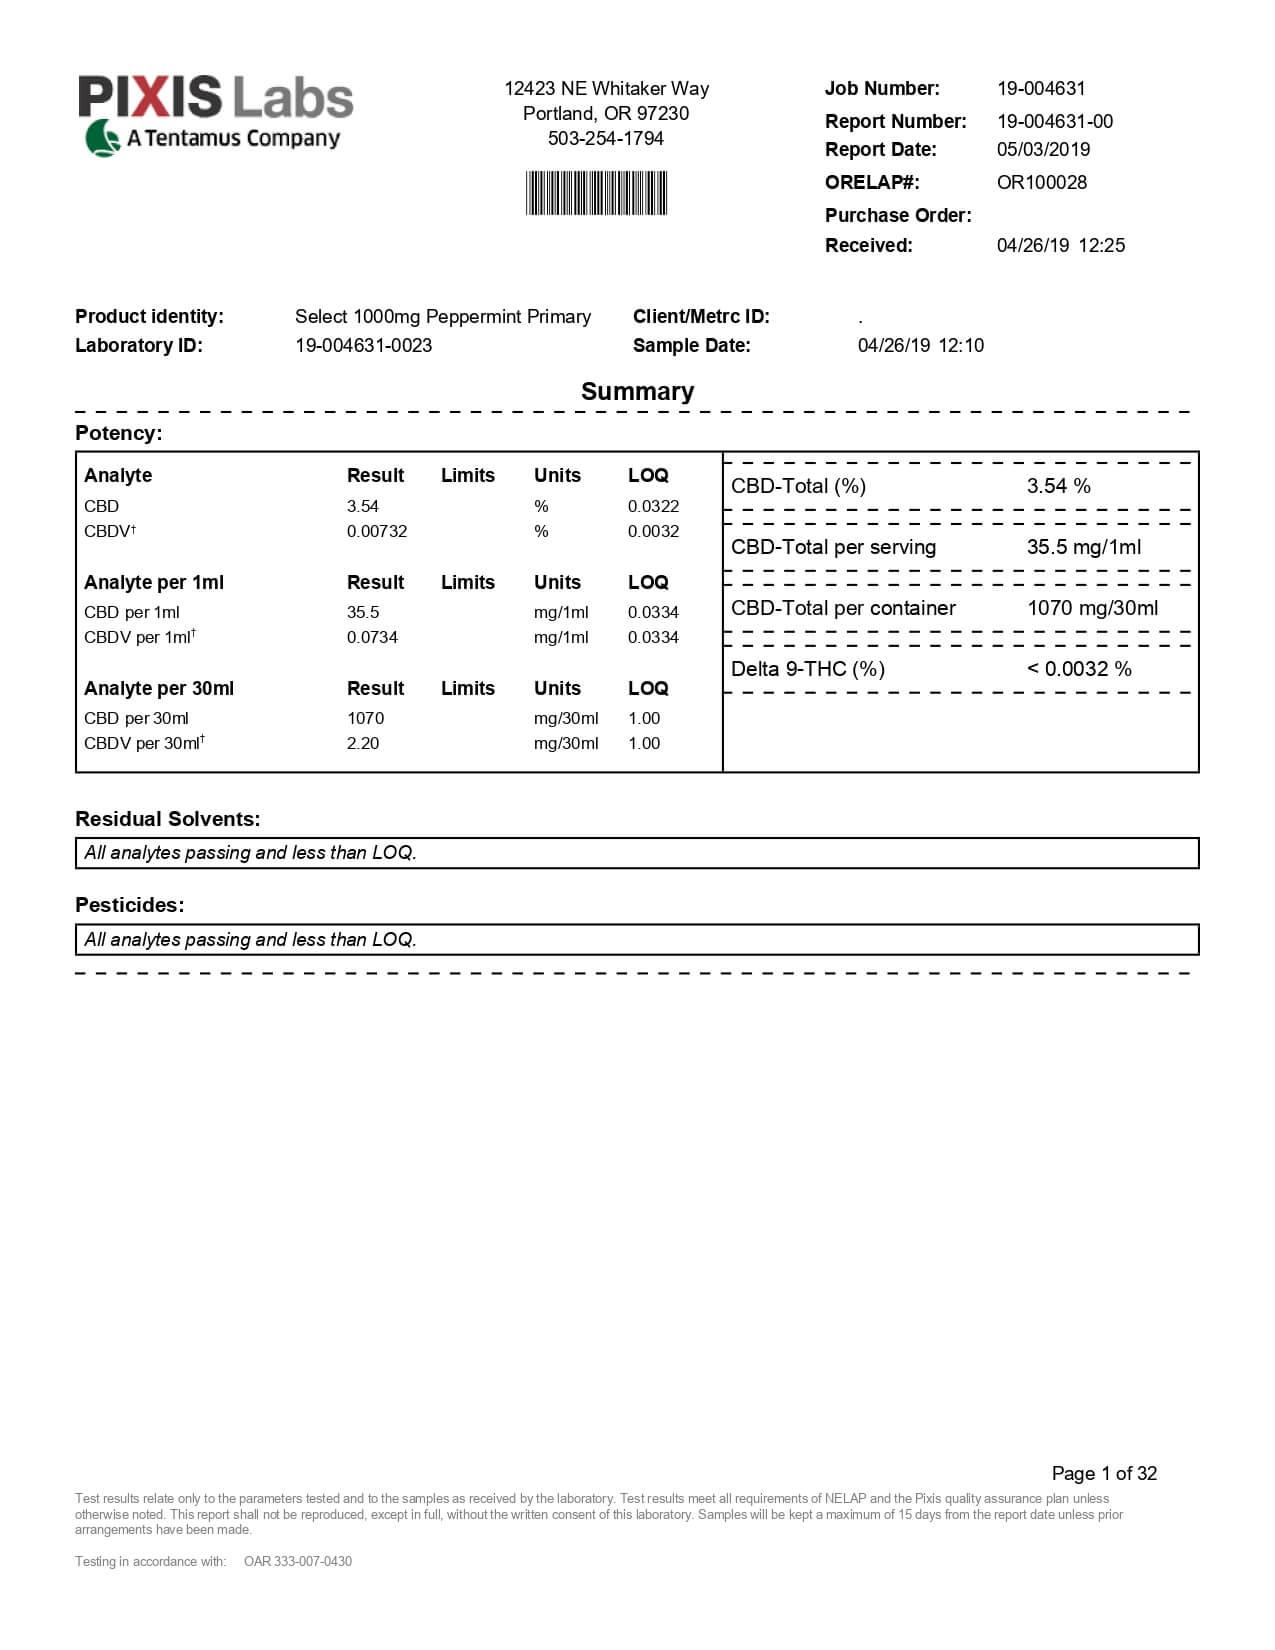 Select CBD Tincture Peppermint Lab Report